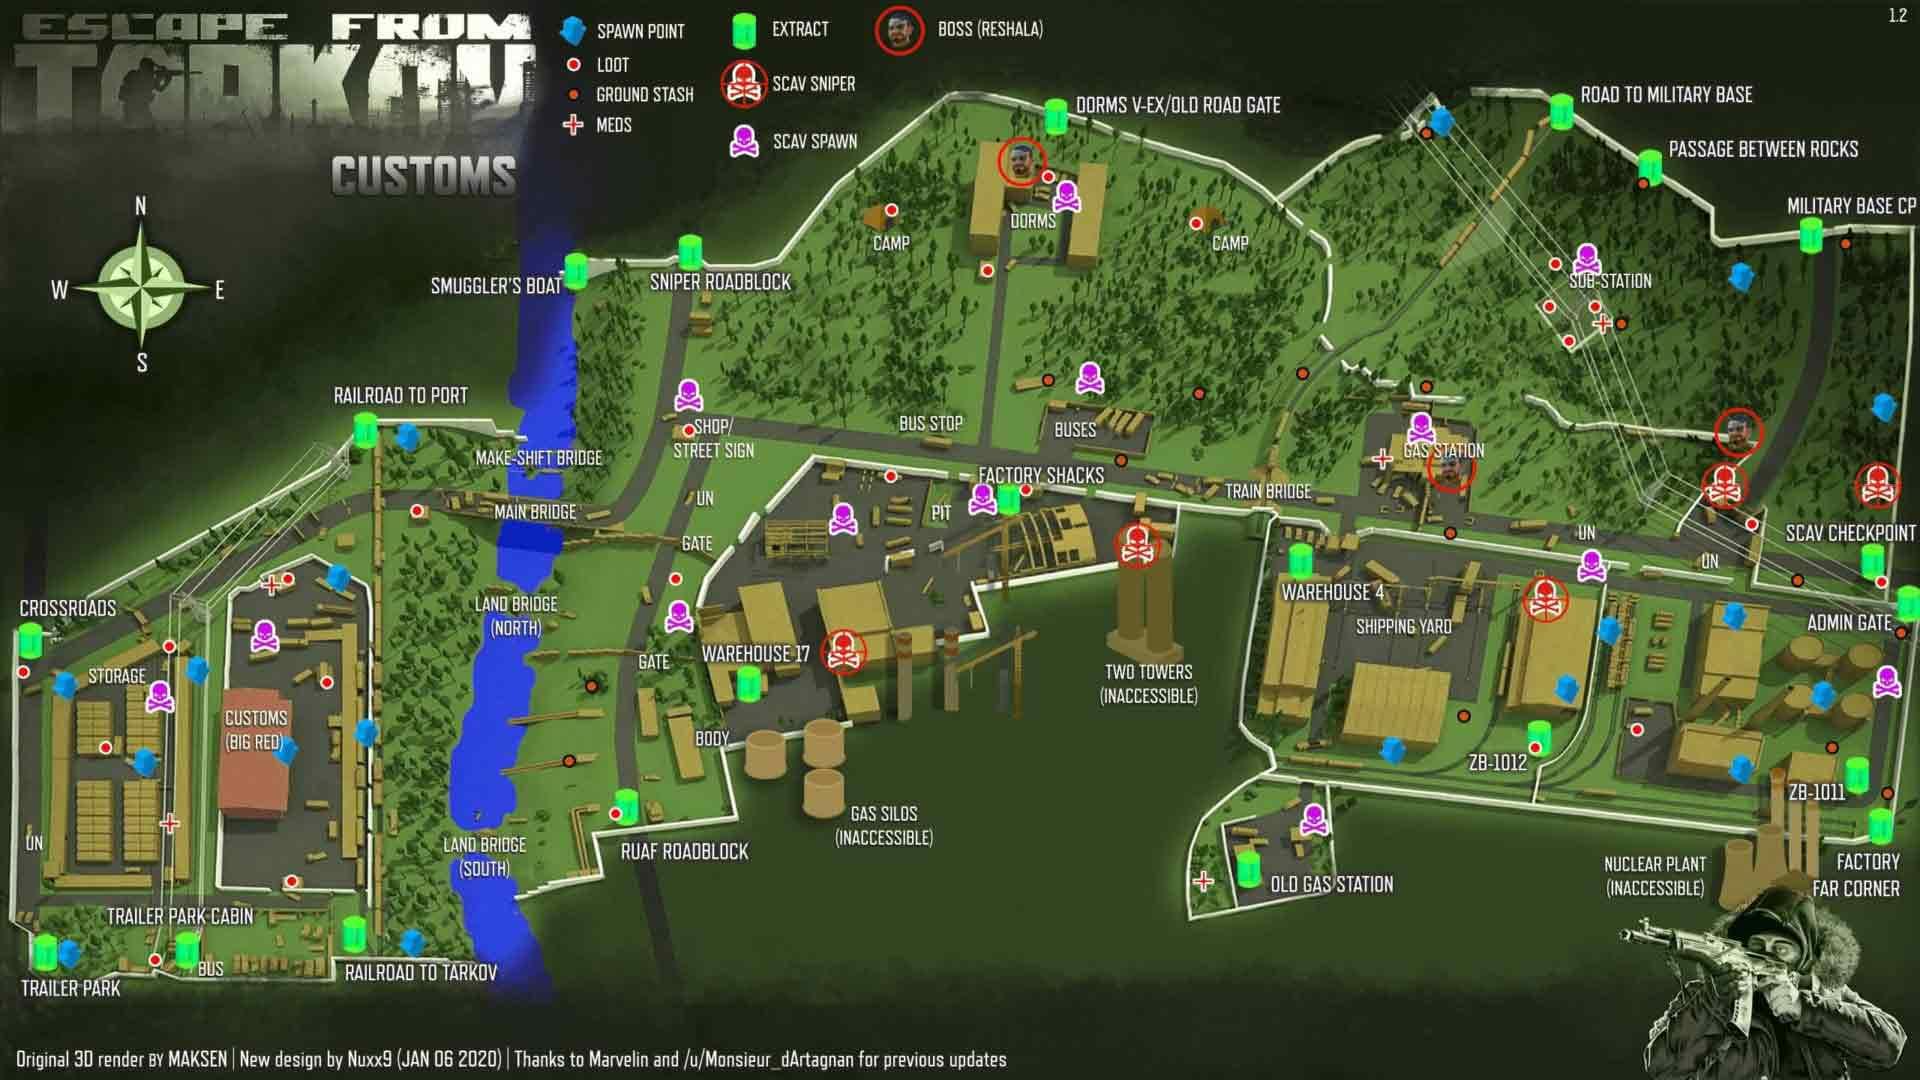 Escape-from-Tarkov-Map-และฉากสุดยิ่งใหญ่1